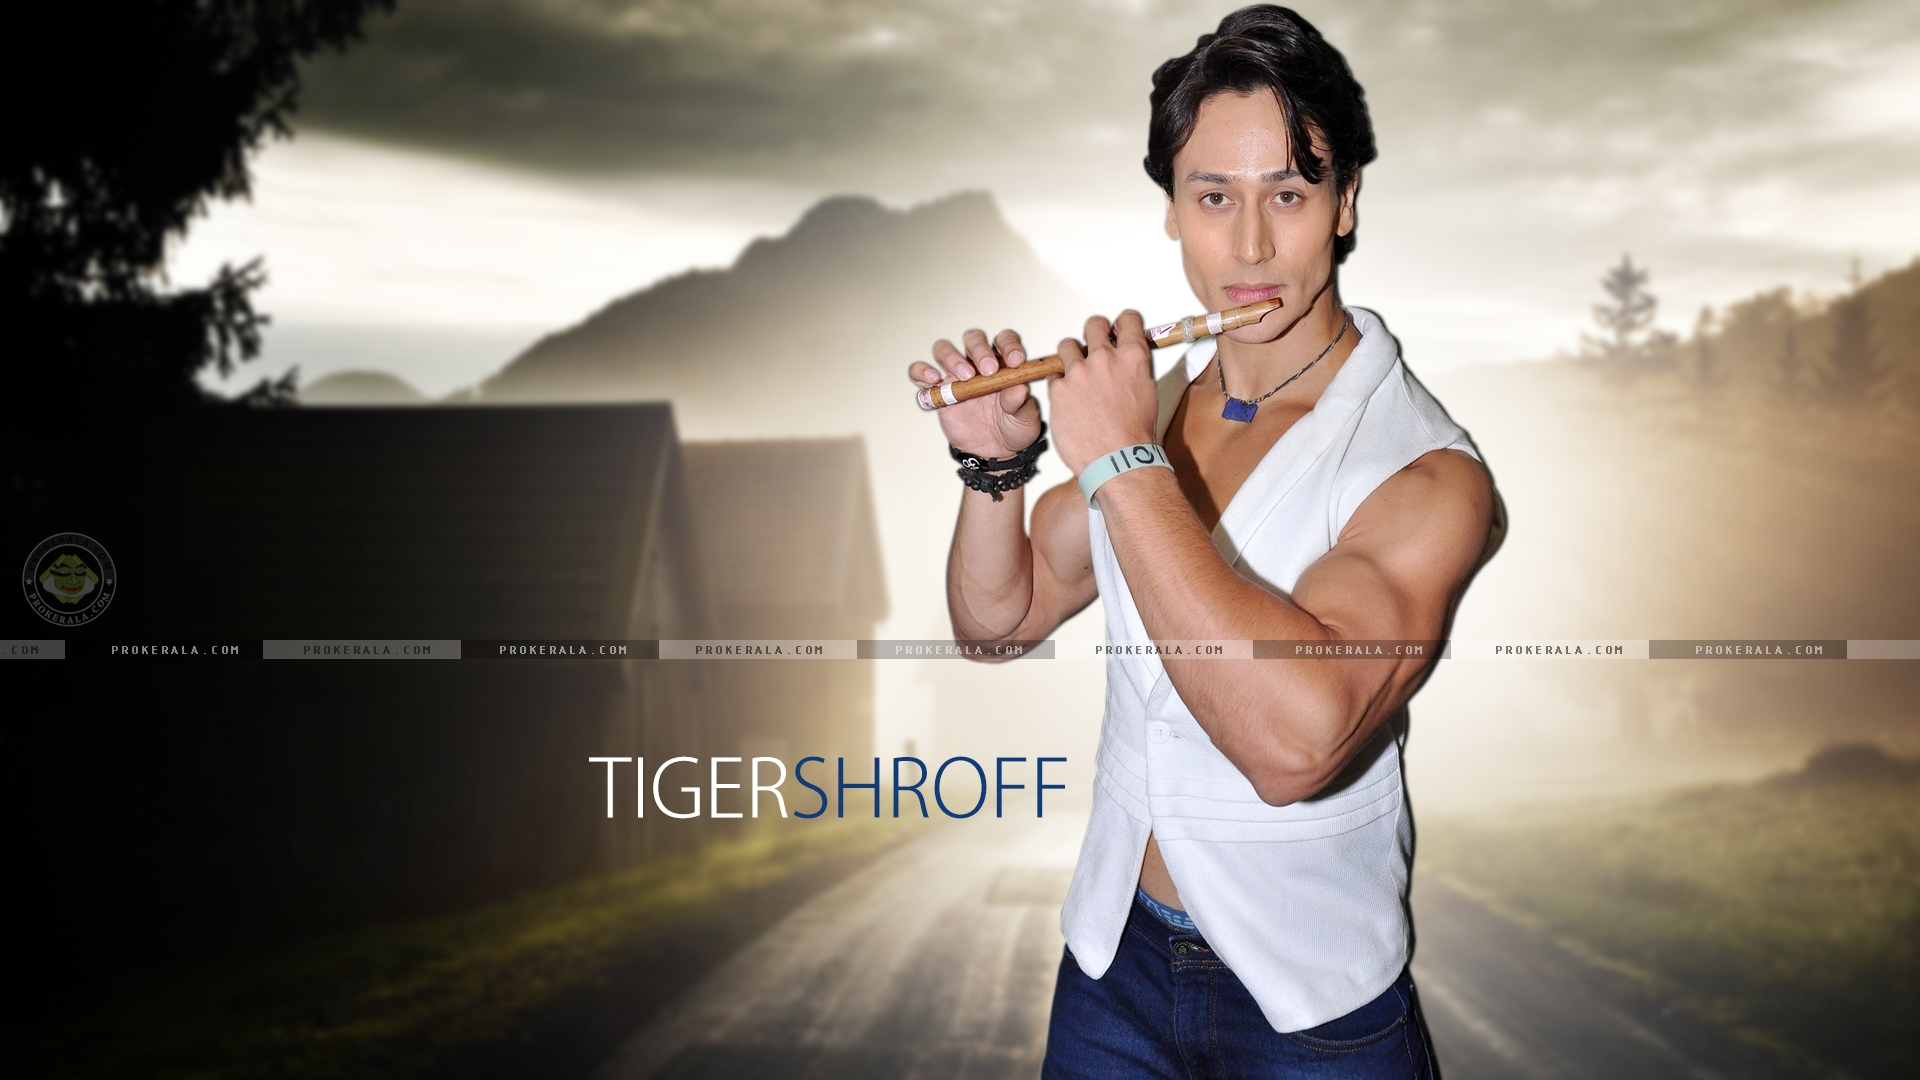 Tiger Shroff Images HD